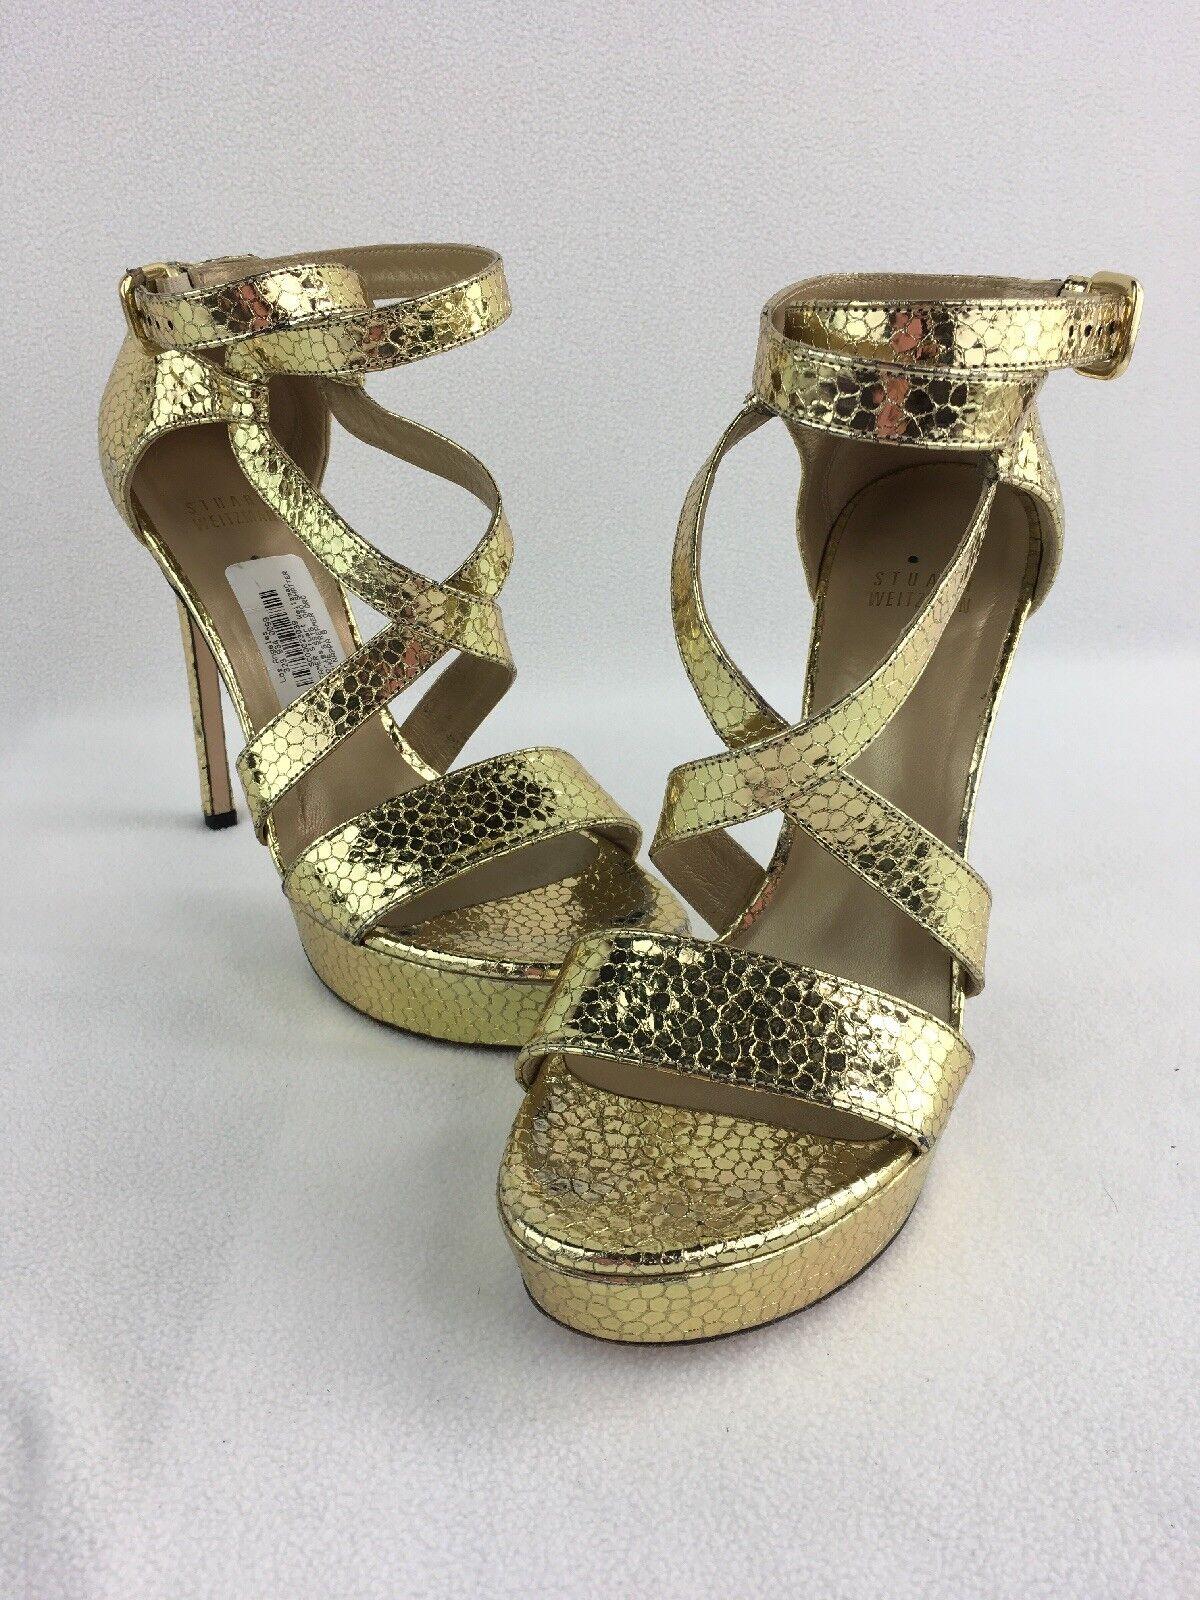 Stuart Weitzman Streamer Oro Shatter Nappa Platform Heel Sandals Size 8M  D2860/